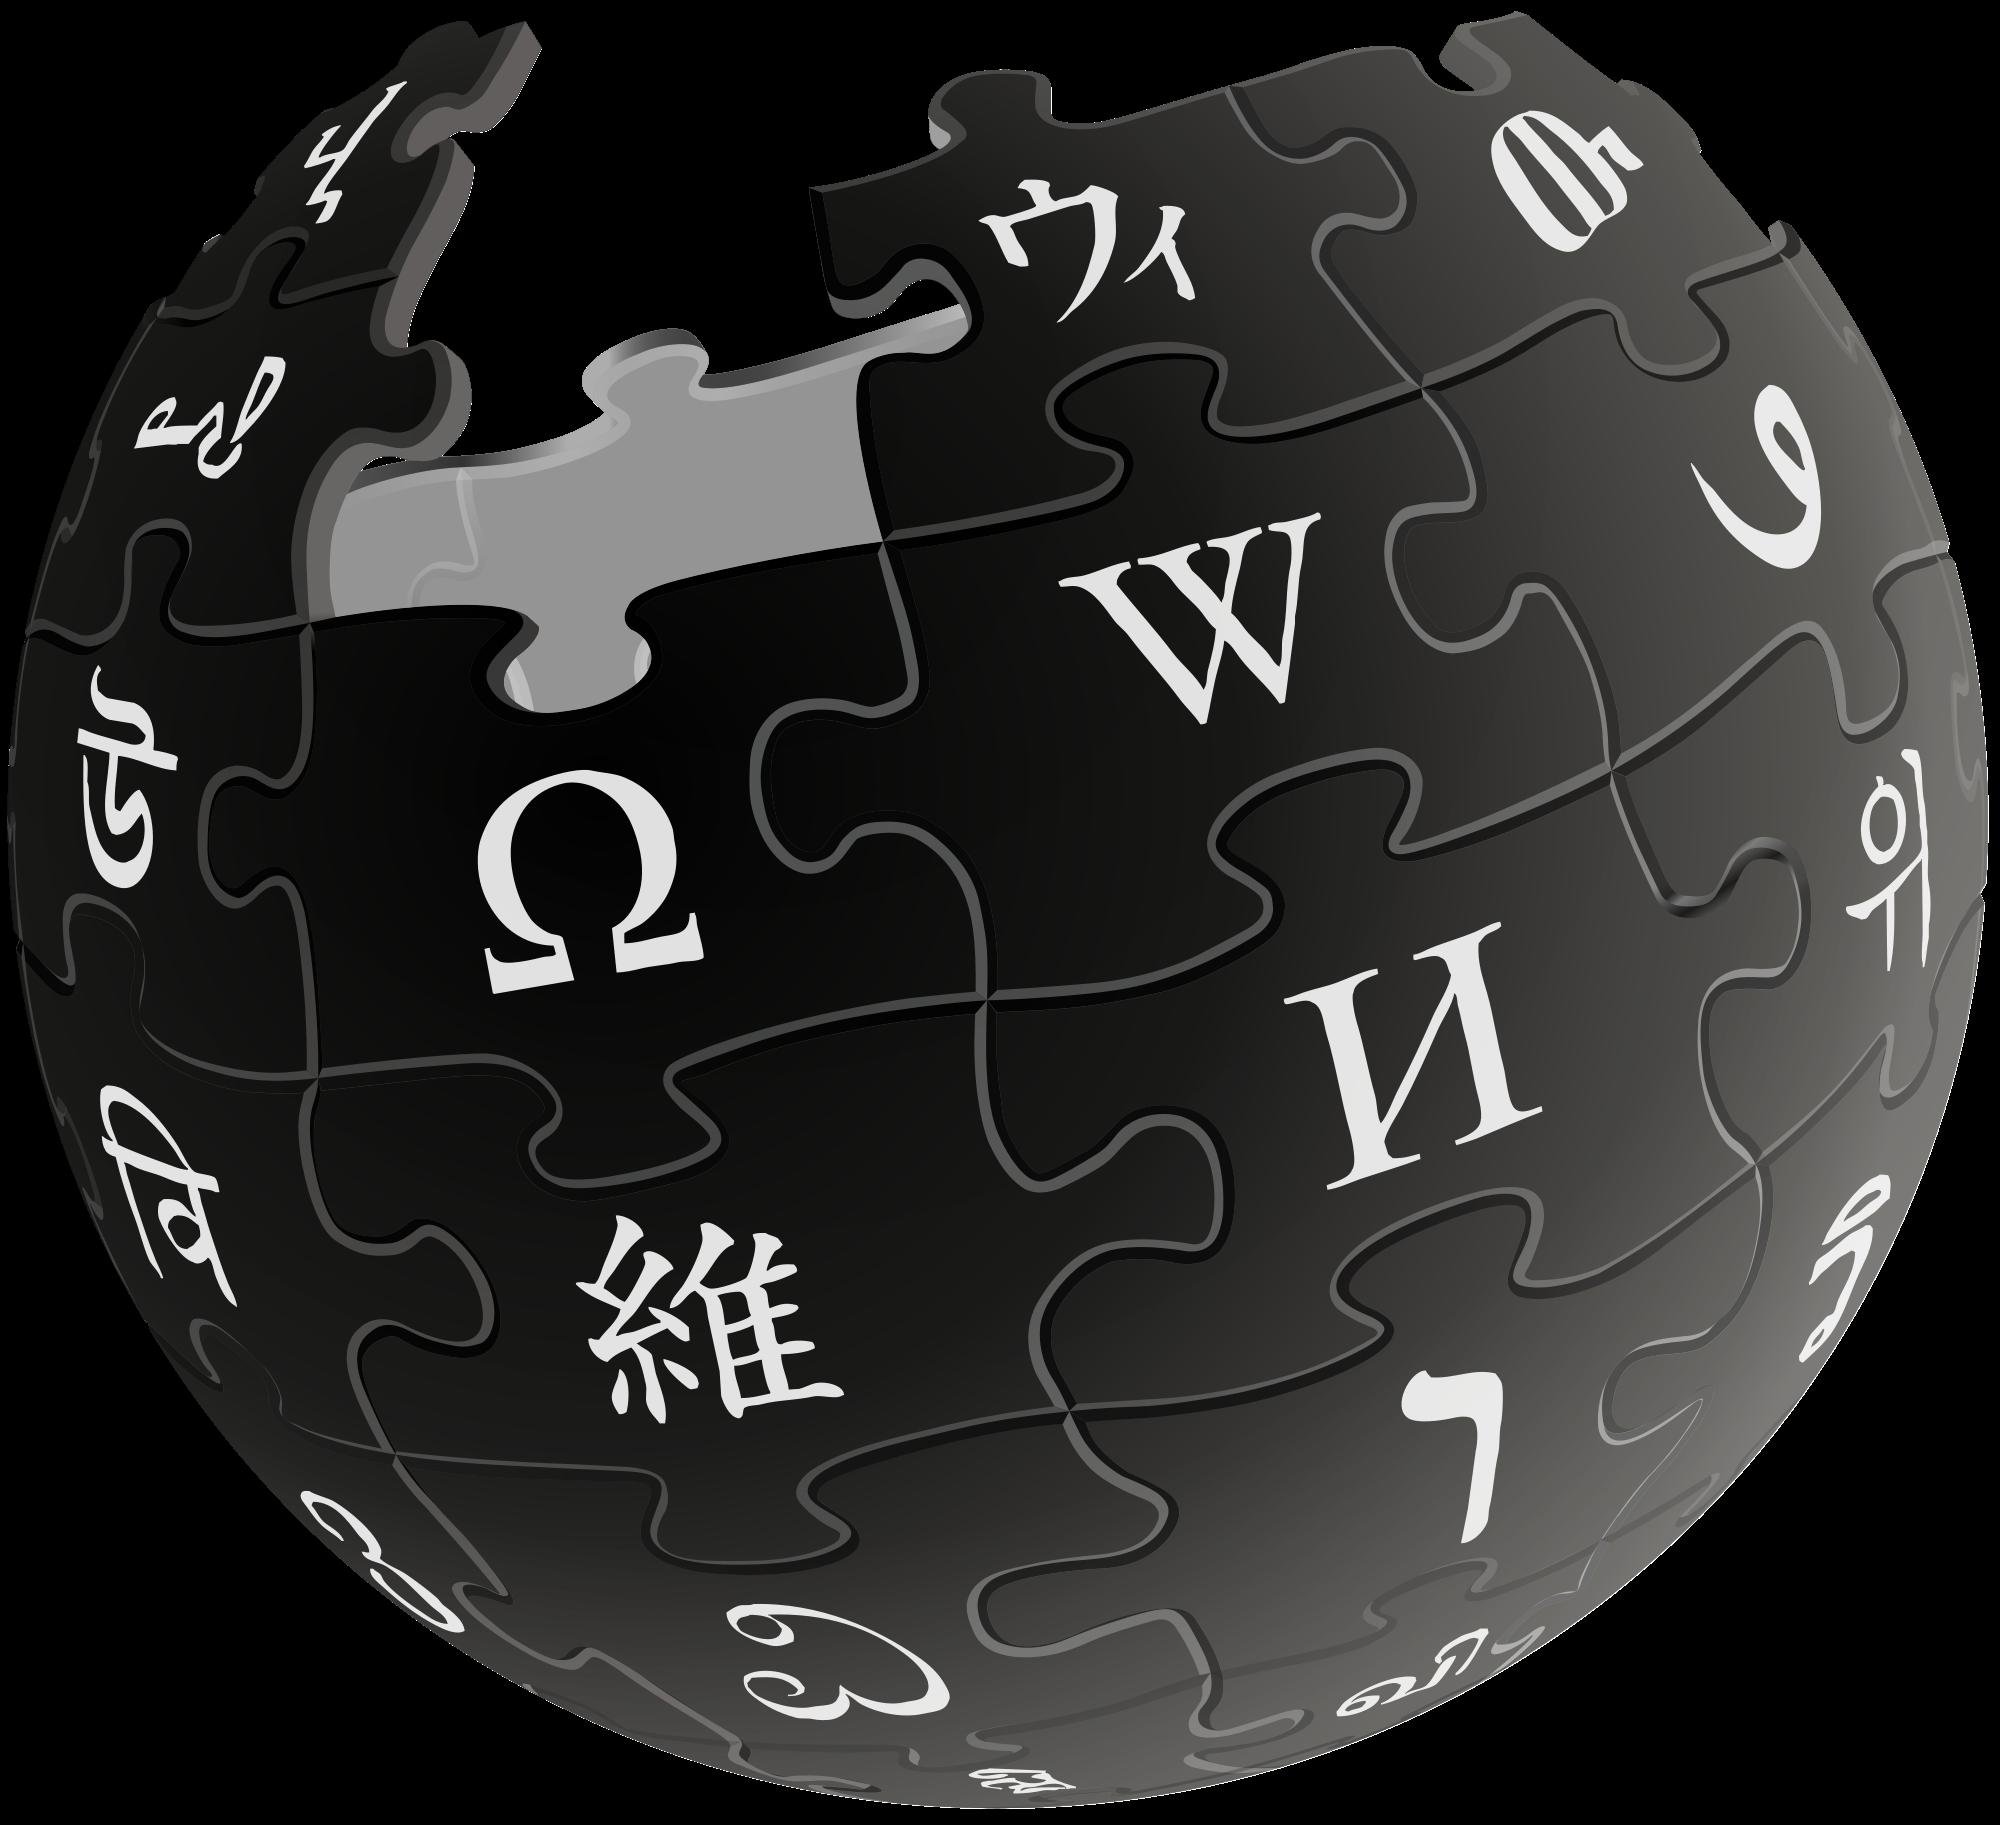 File:Wiki.